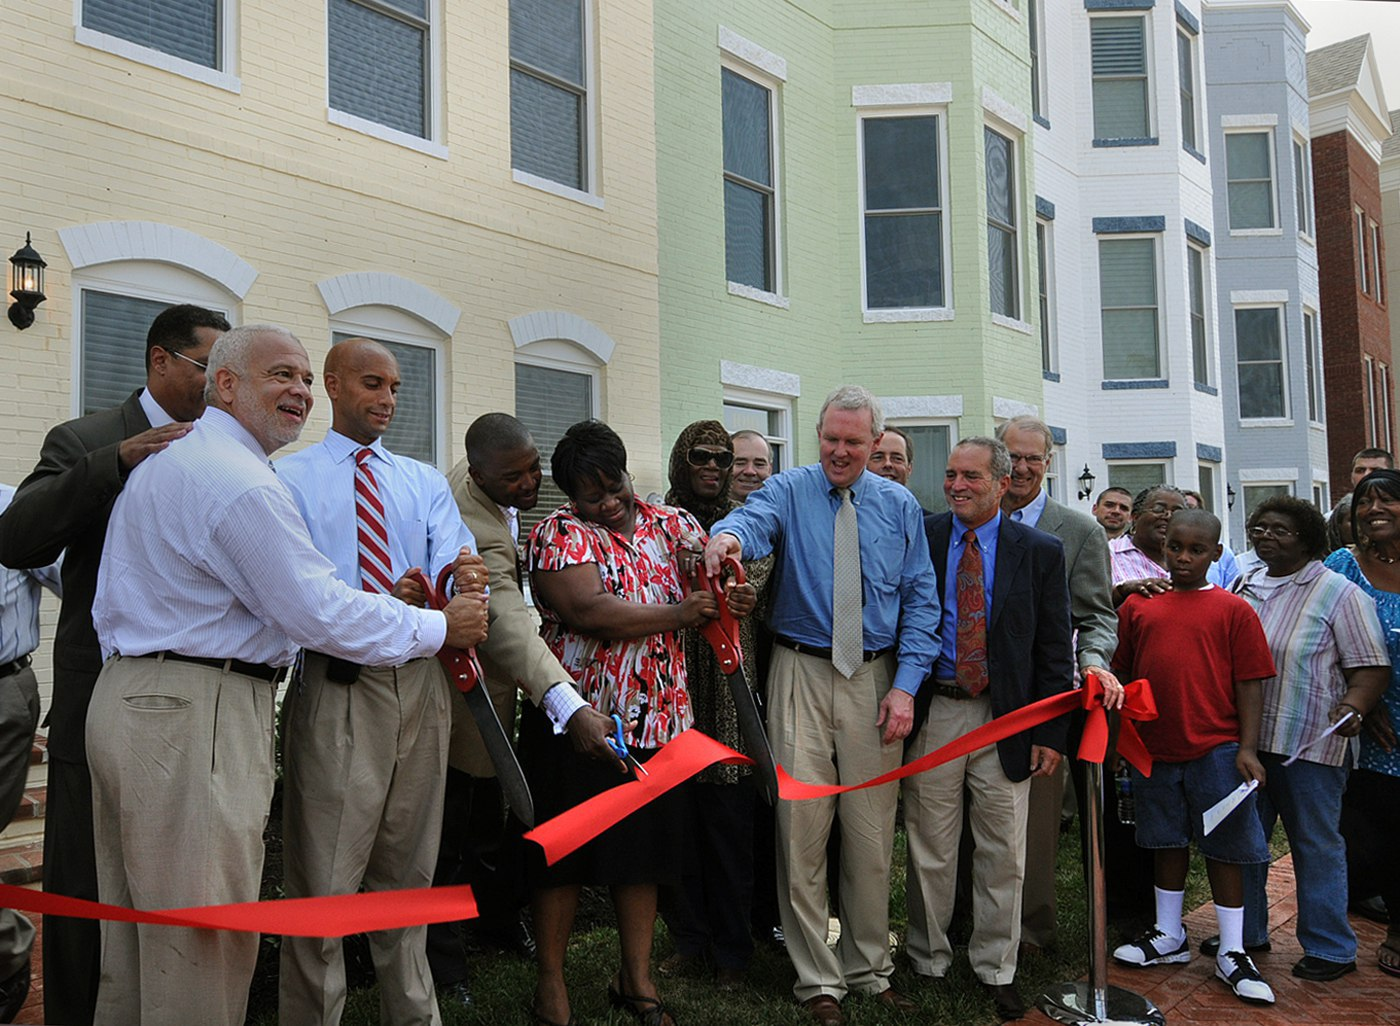 Capitol Quarter Welcomes Mayor Fenty